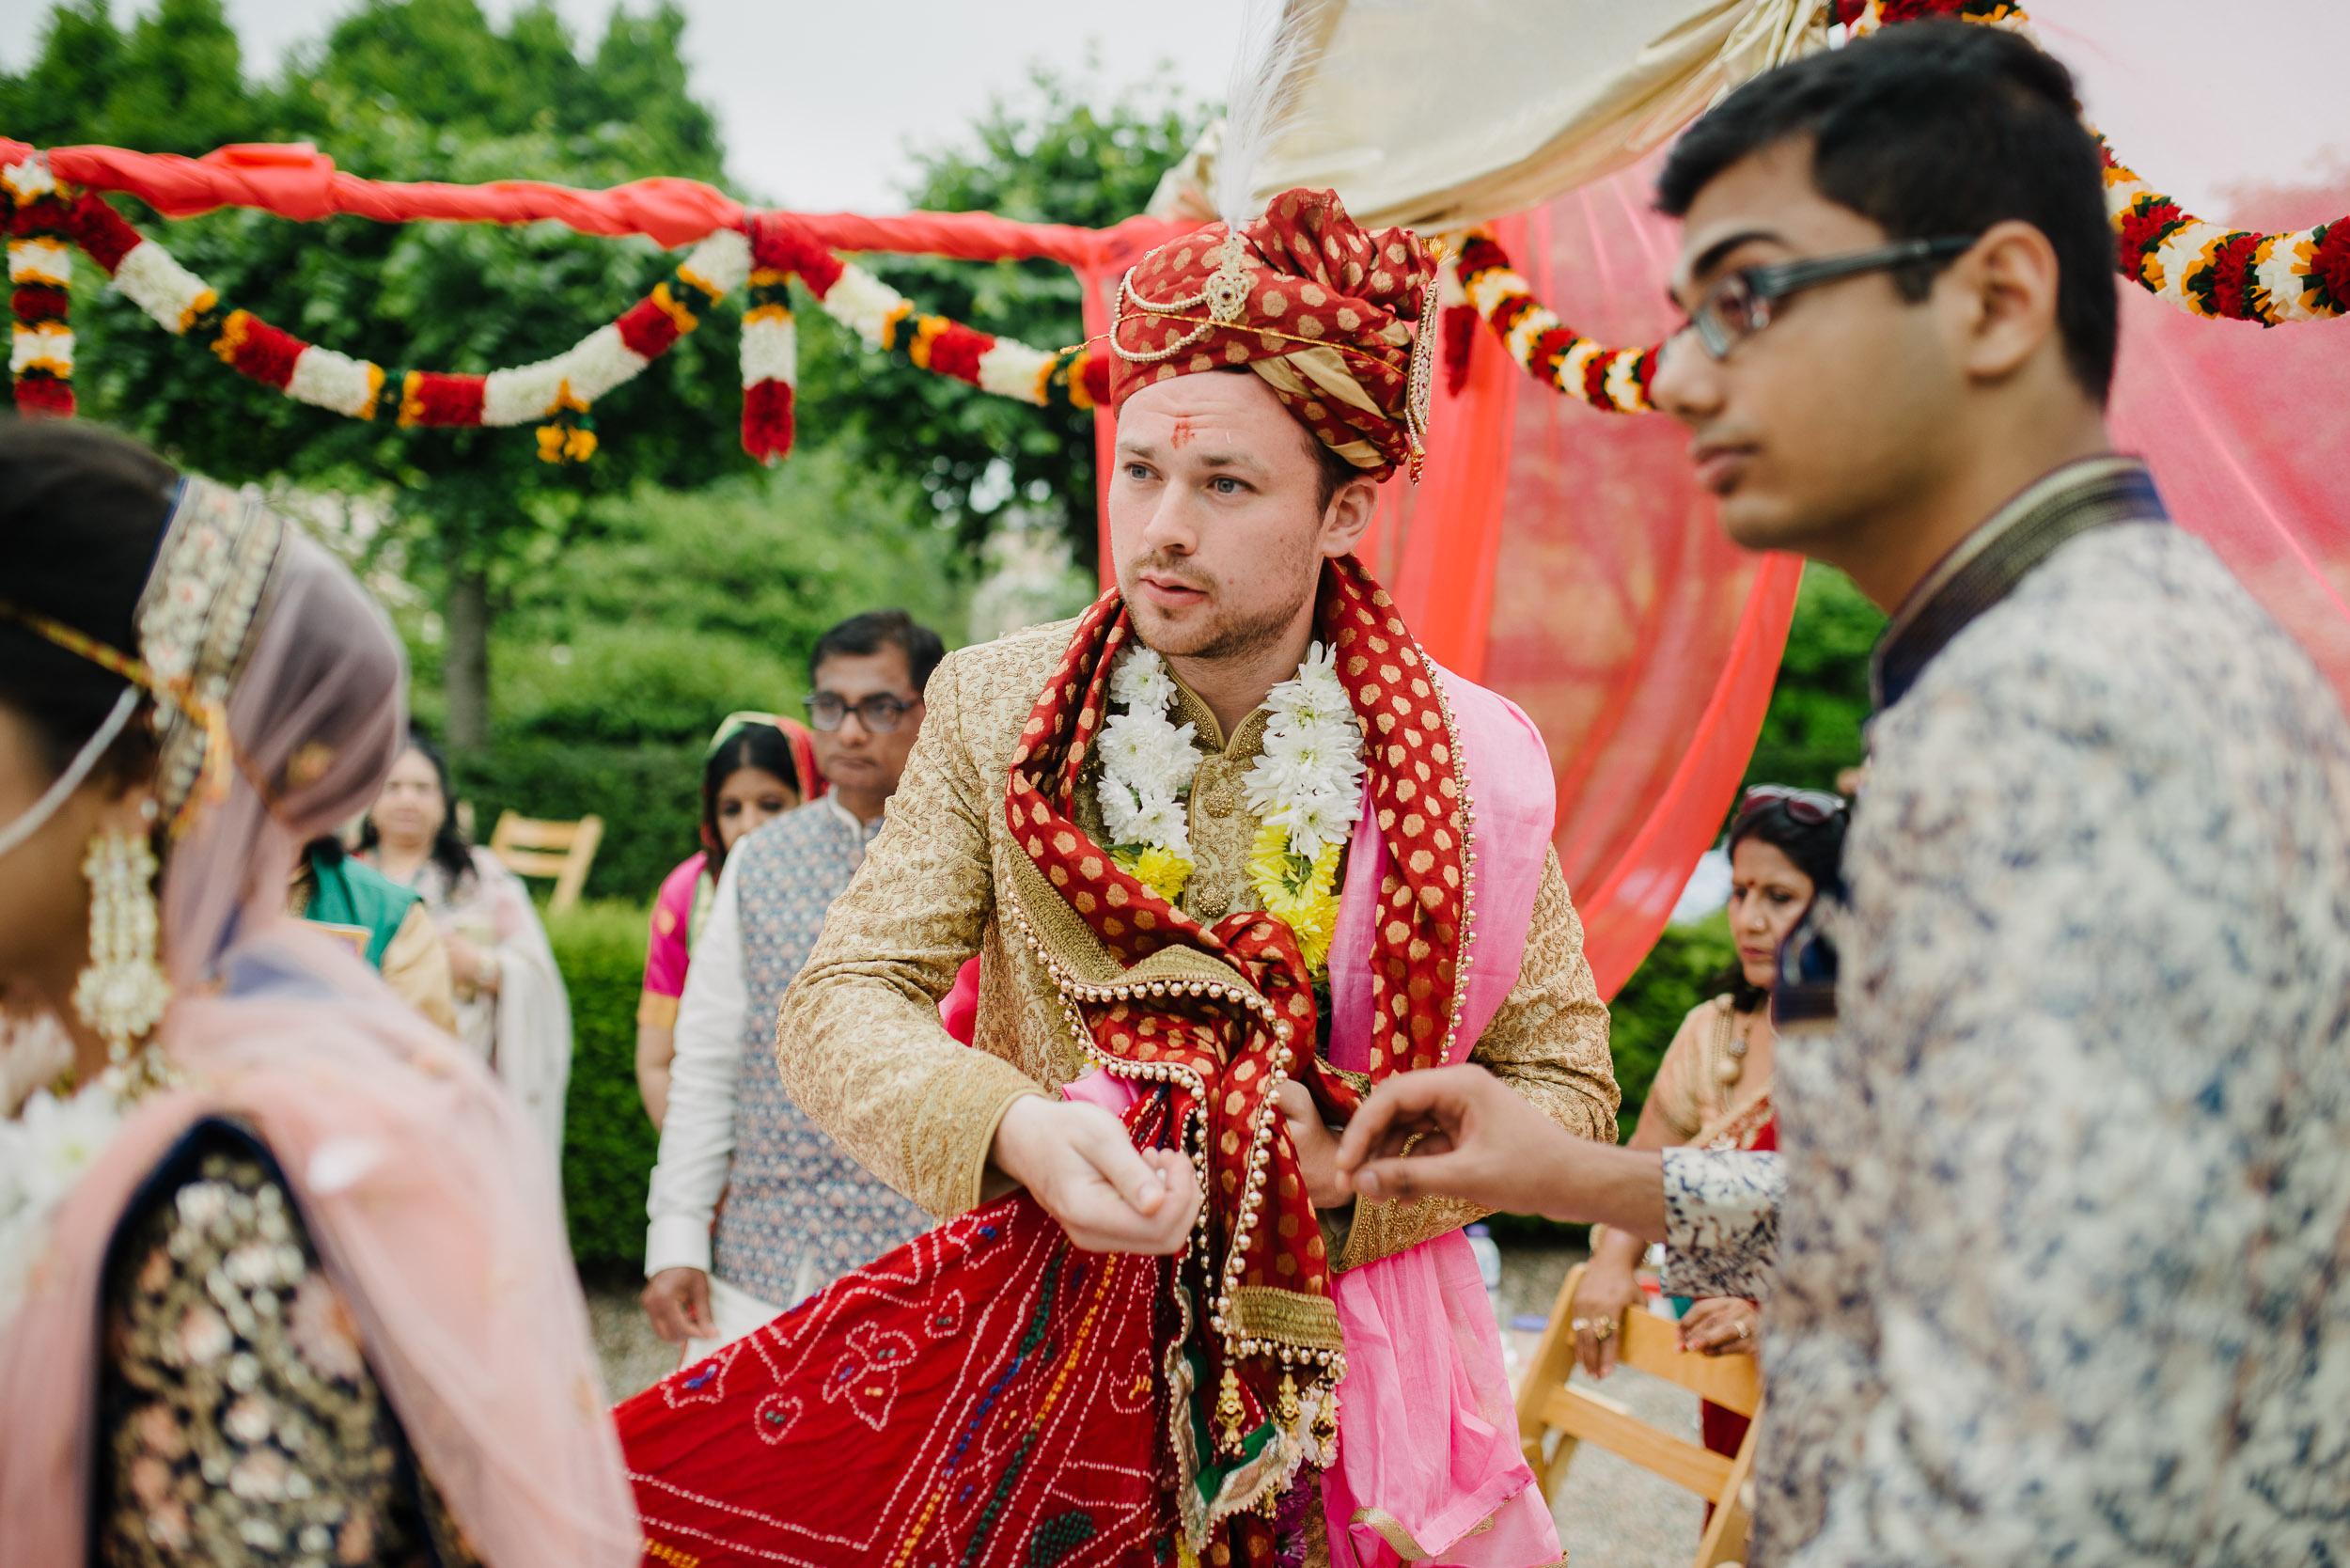 larchfield hindu wedding northern ireland-78.jpg